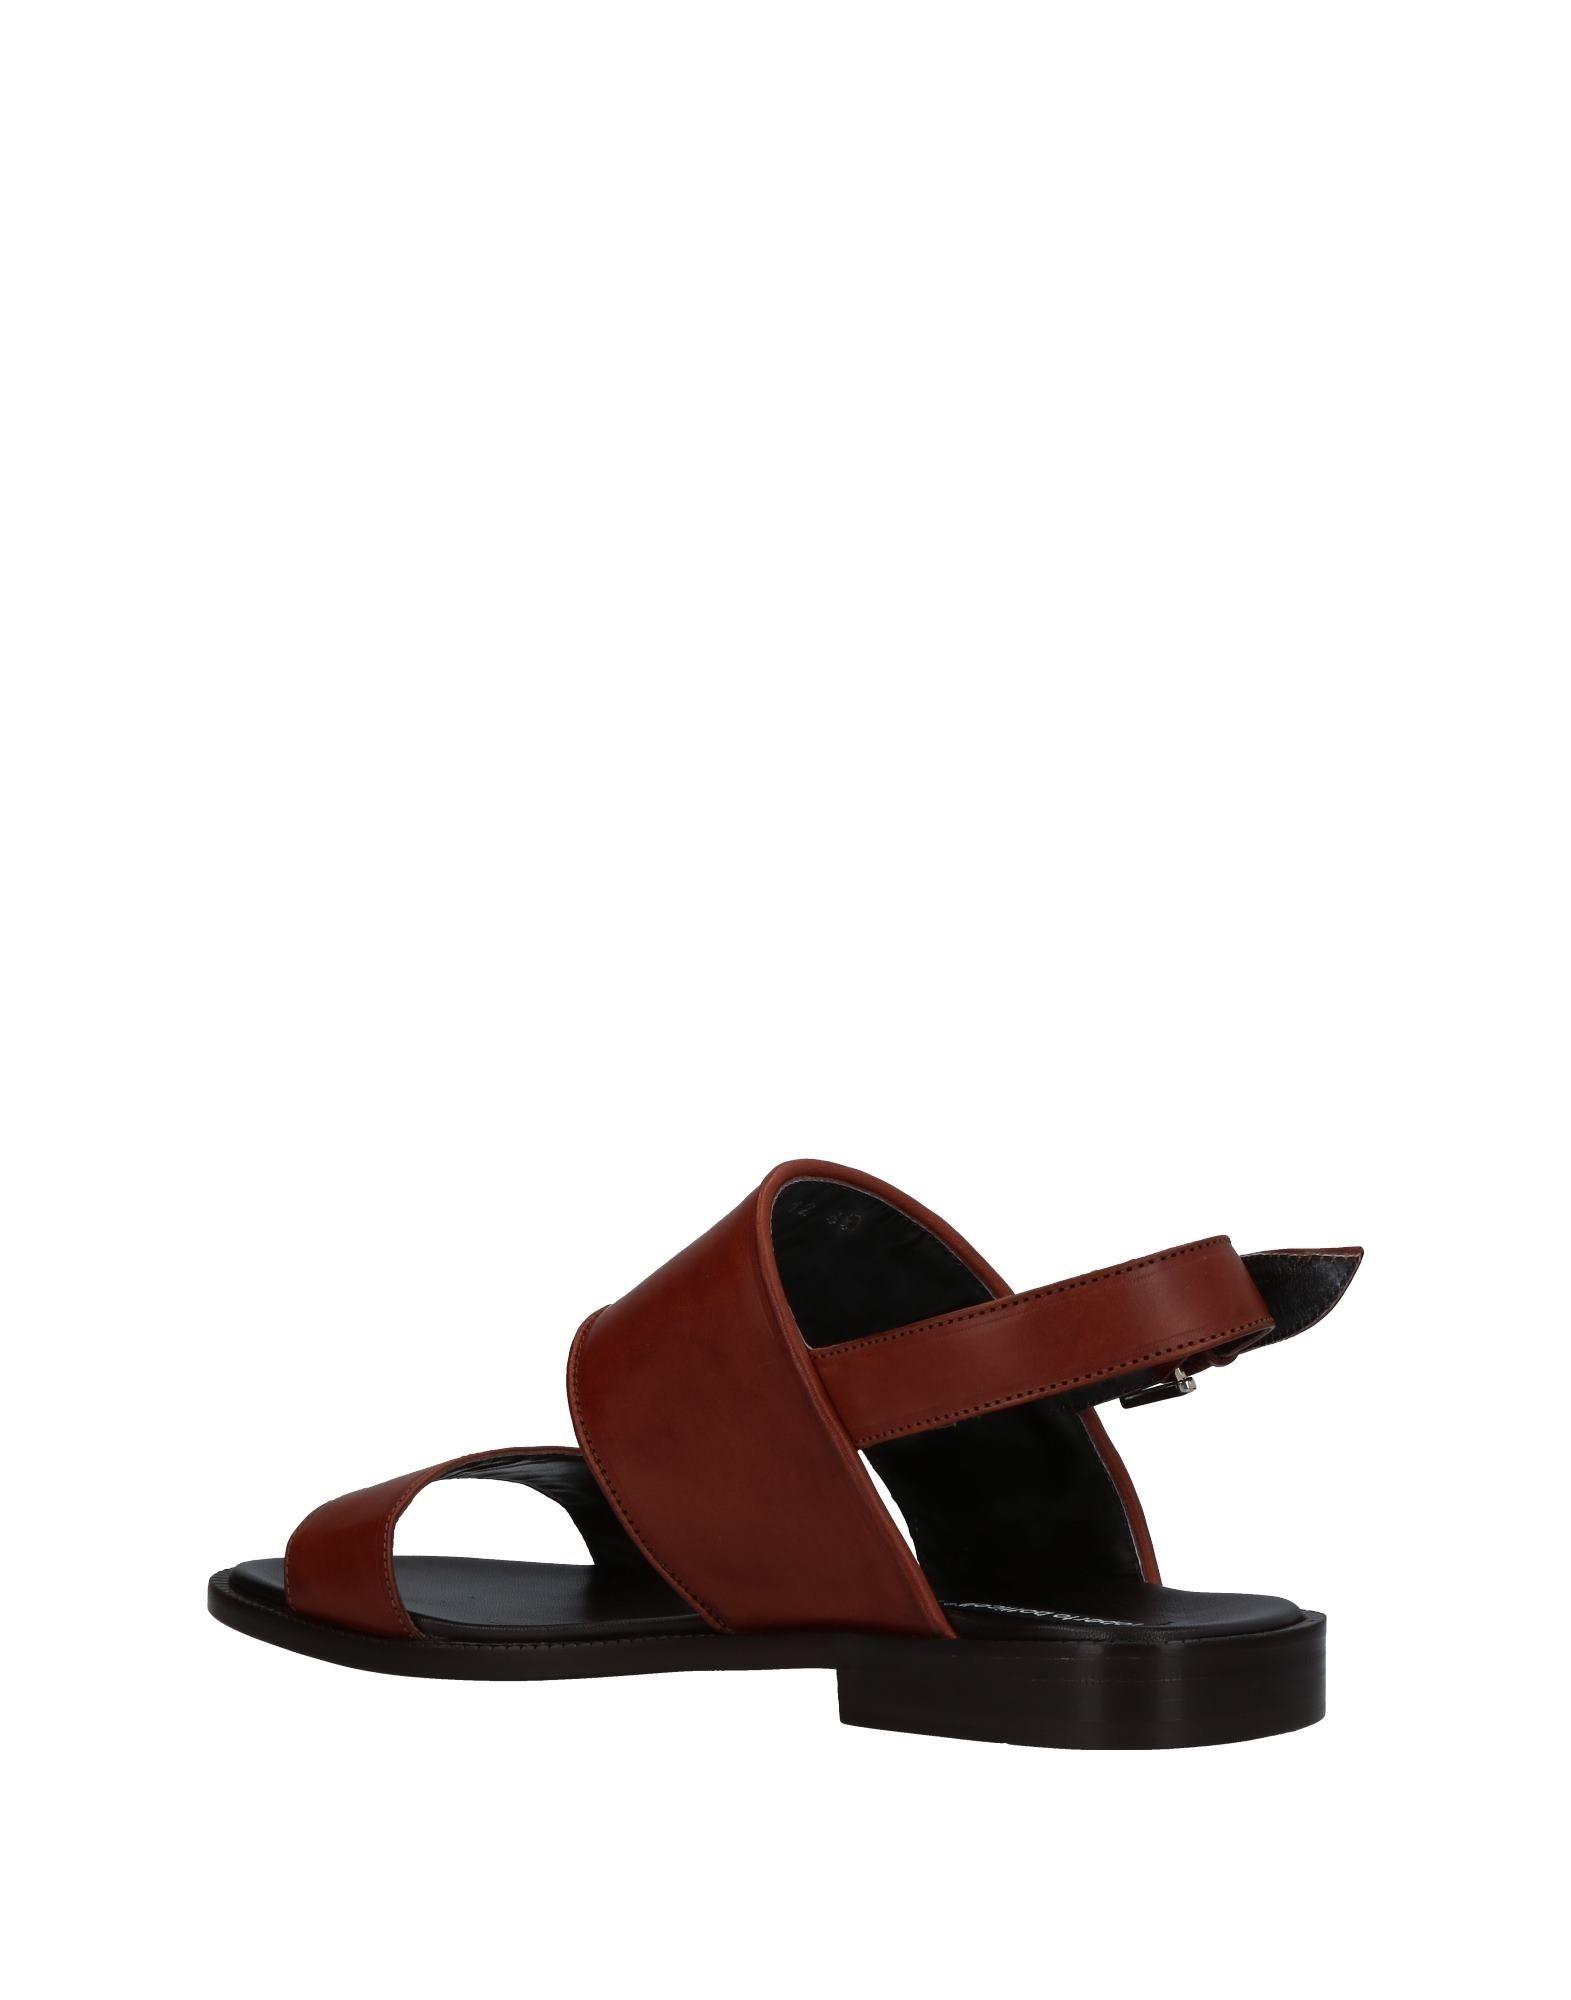 Chaussures - Tribunaux Roberto Botticelli Wlf8T0Wr